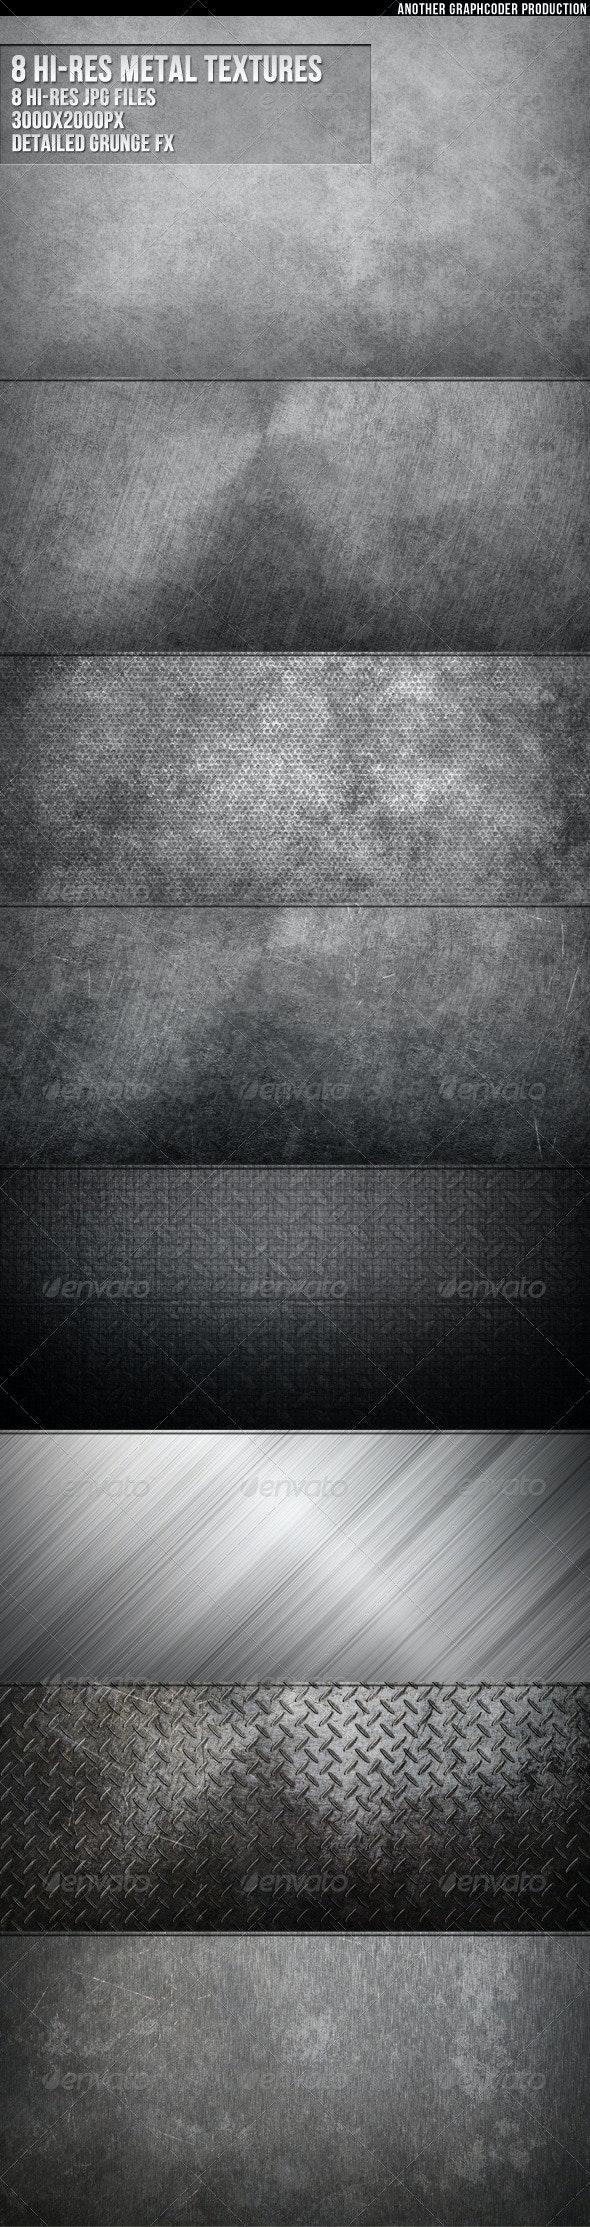 8 Hi-Res  Metal Textures - Metal Textures